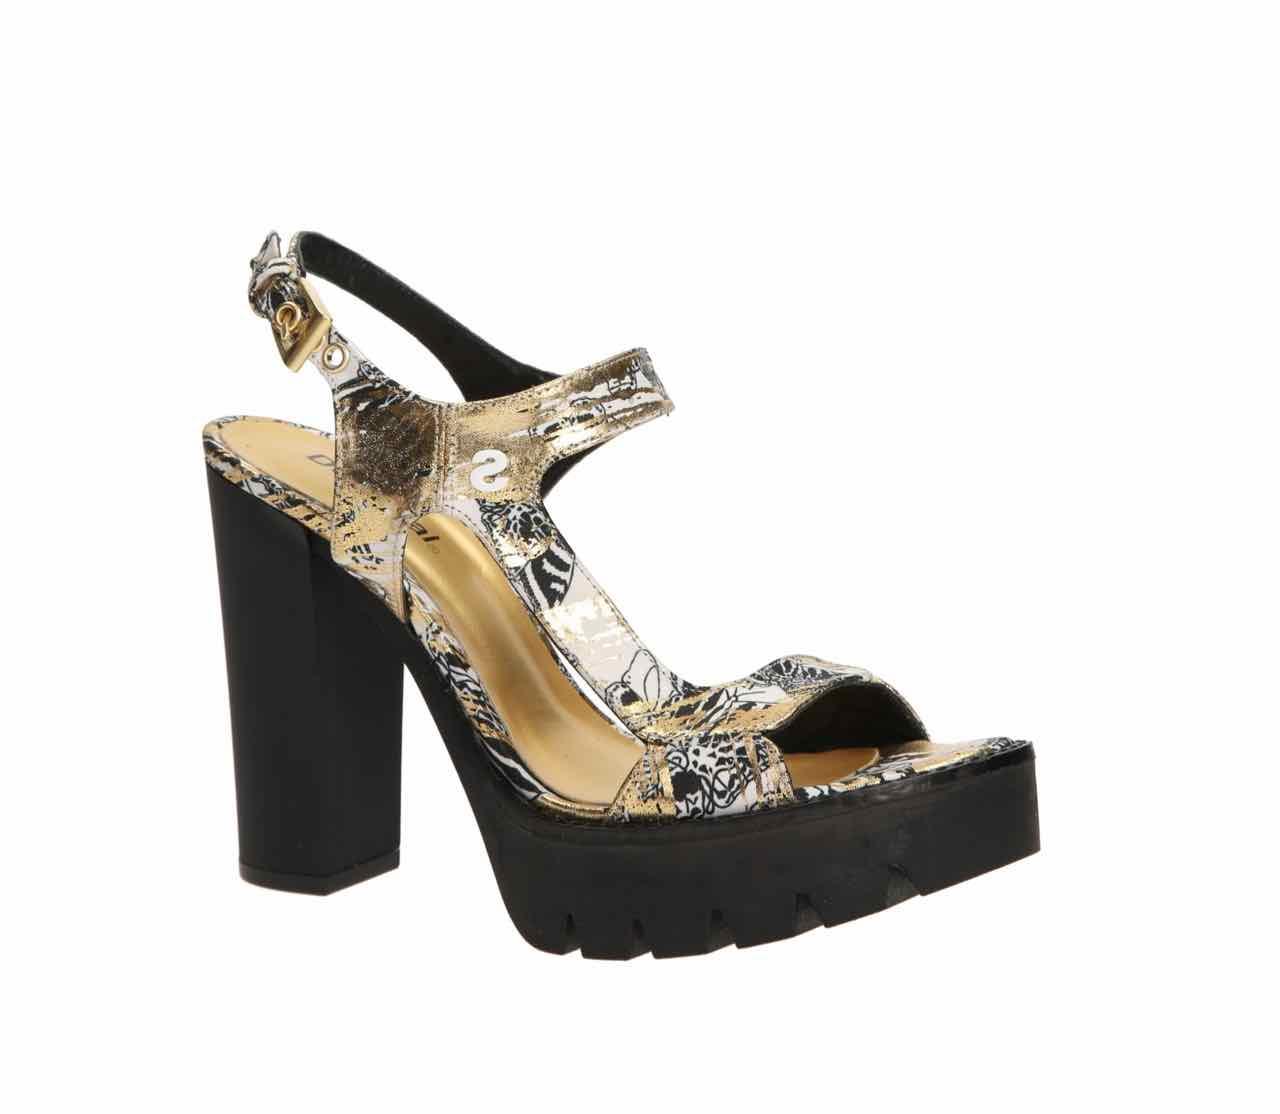 61SS2J2_2000 Desigual Sandals Venice 2